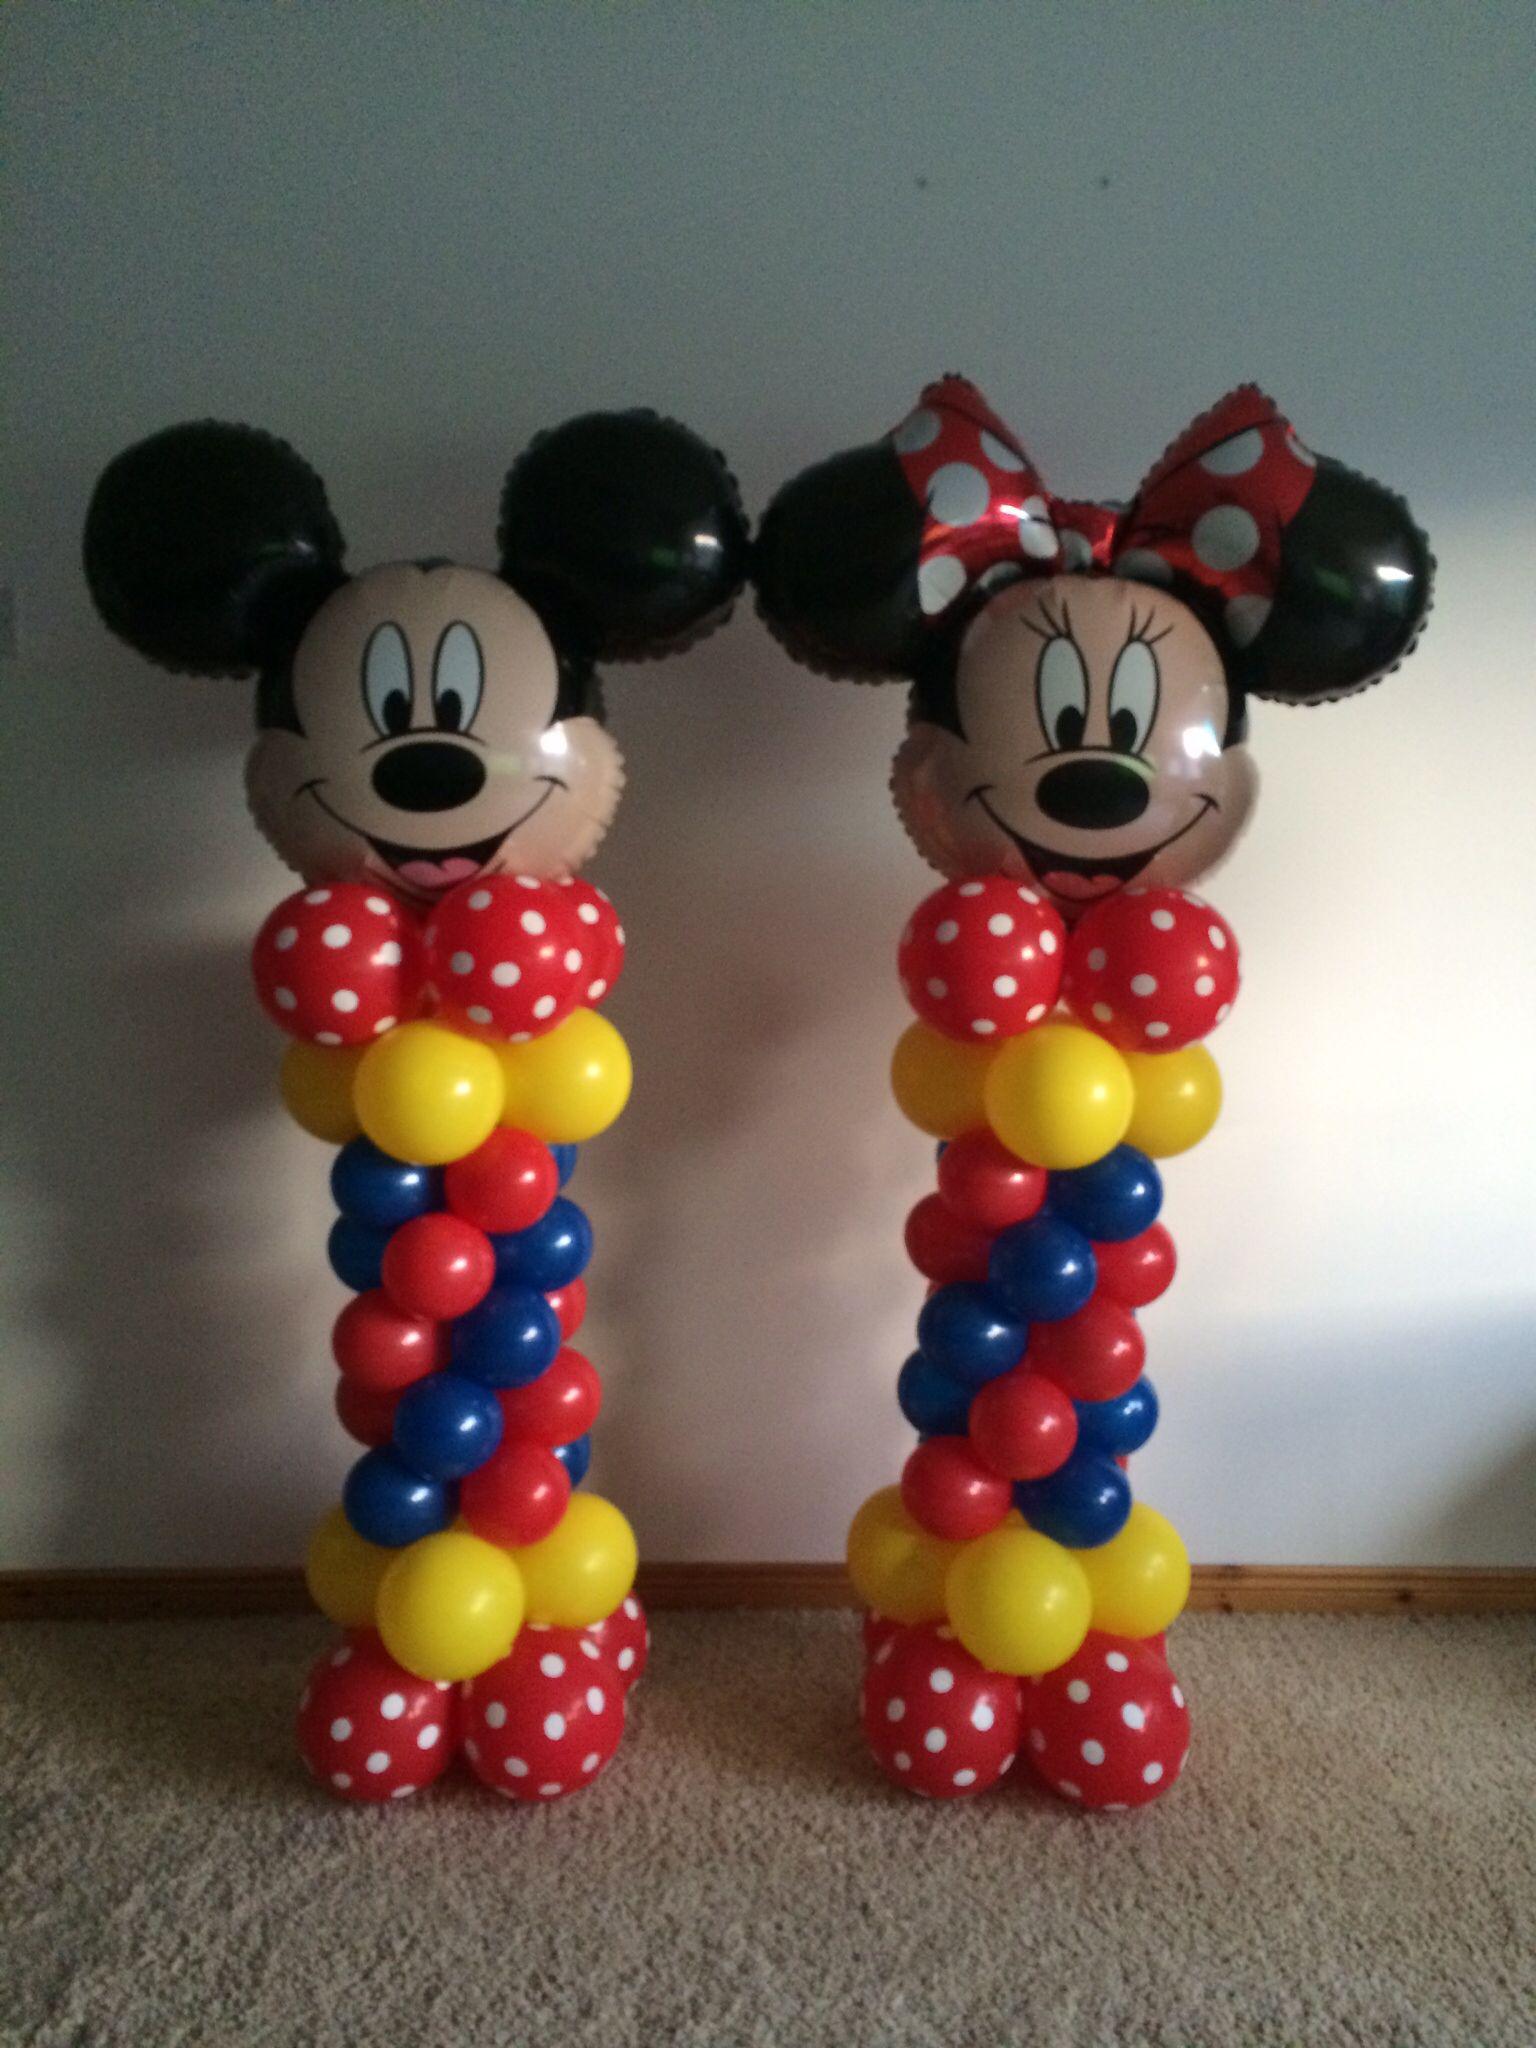 mickey and minnie mouse columns bastel idee pinterest. Black Bedroom Furniture Sets. Home Design Ideas